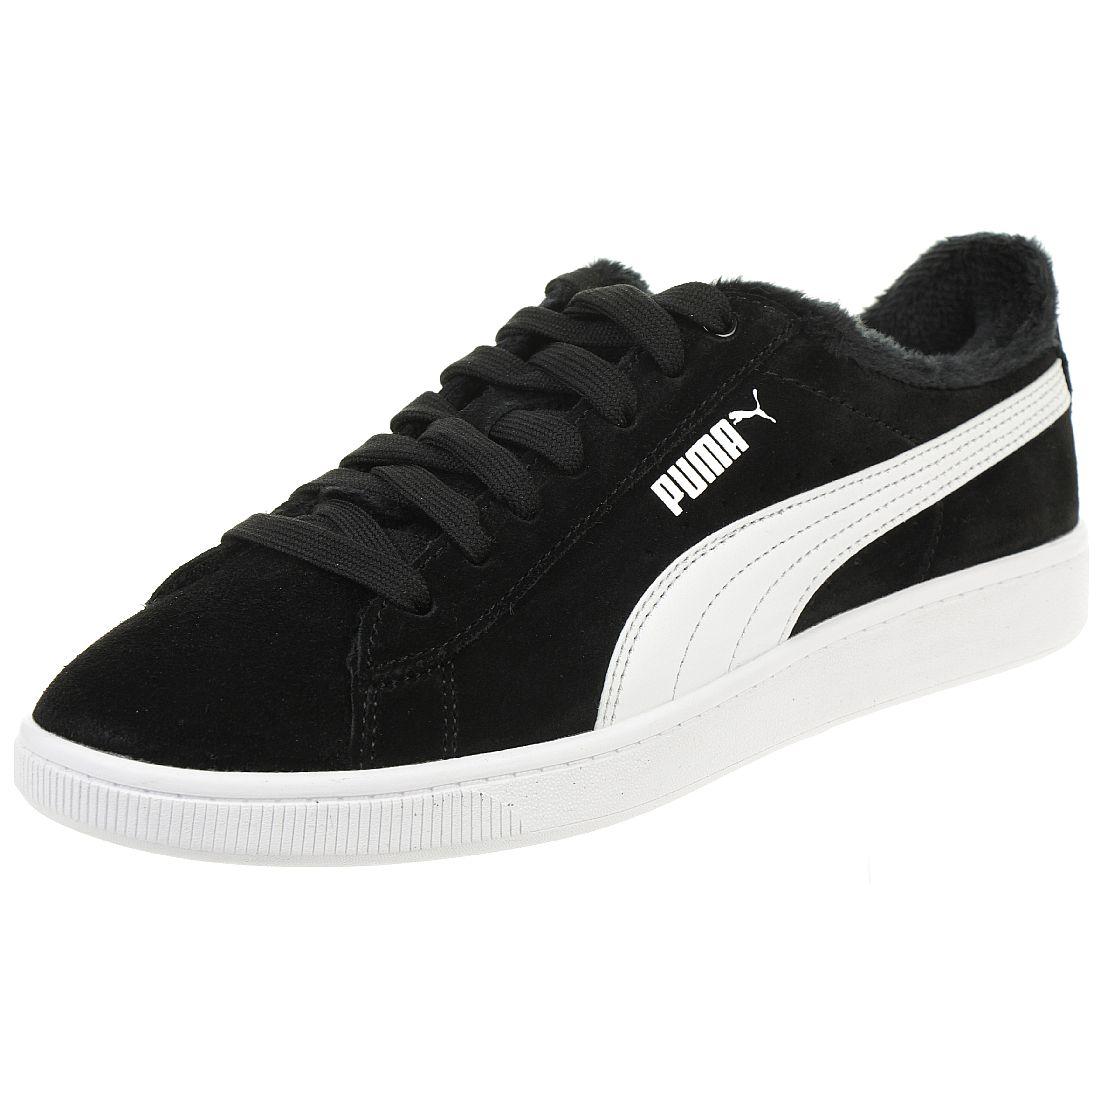 Puma Vikky v2 Fur Damen Sneaker Winterschuhe Schuhe